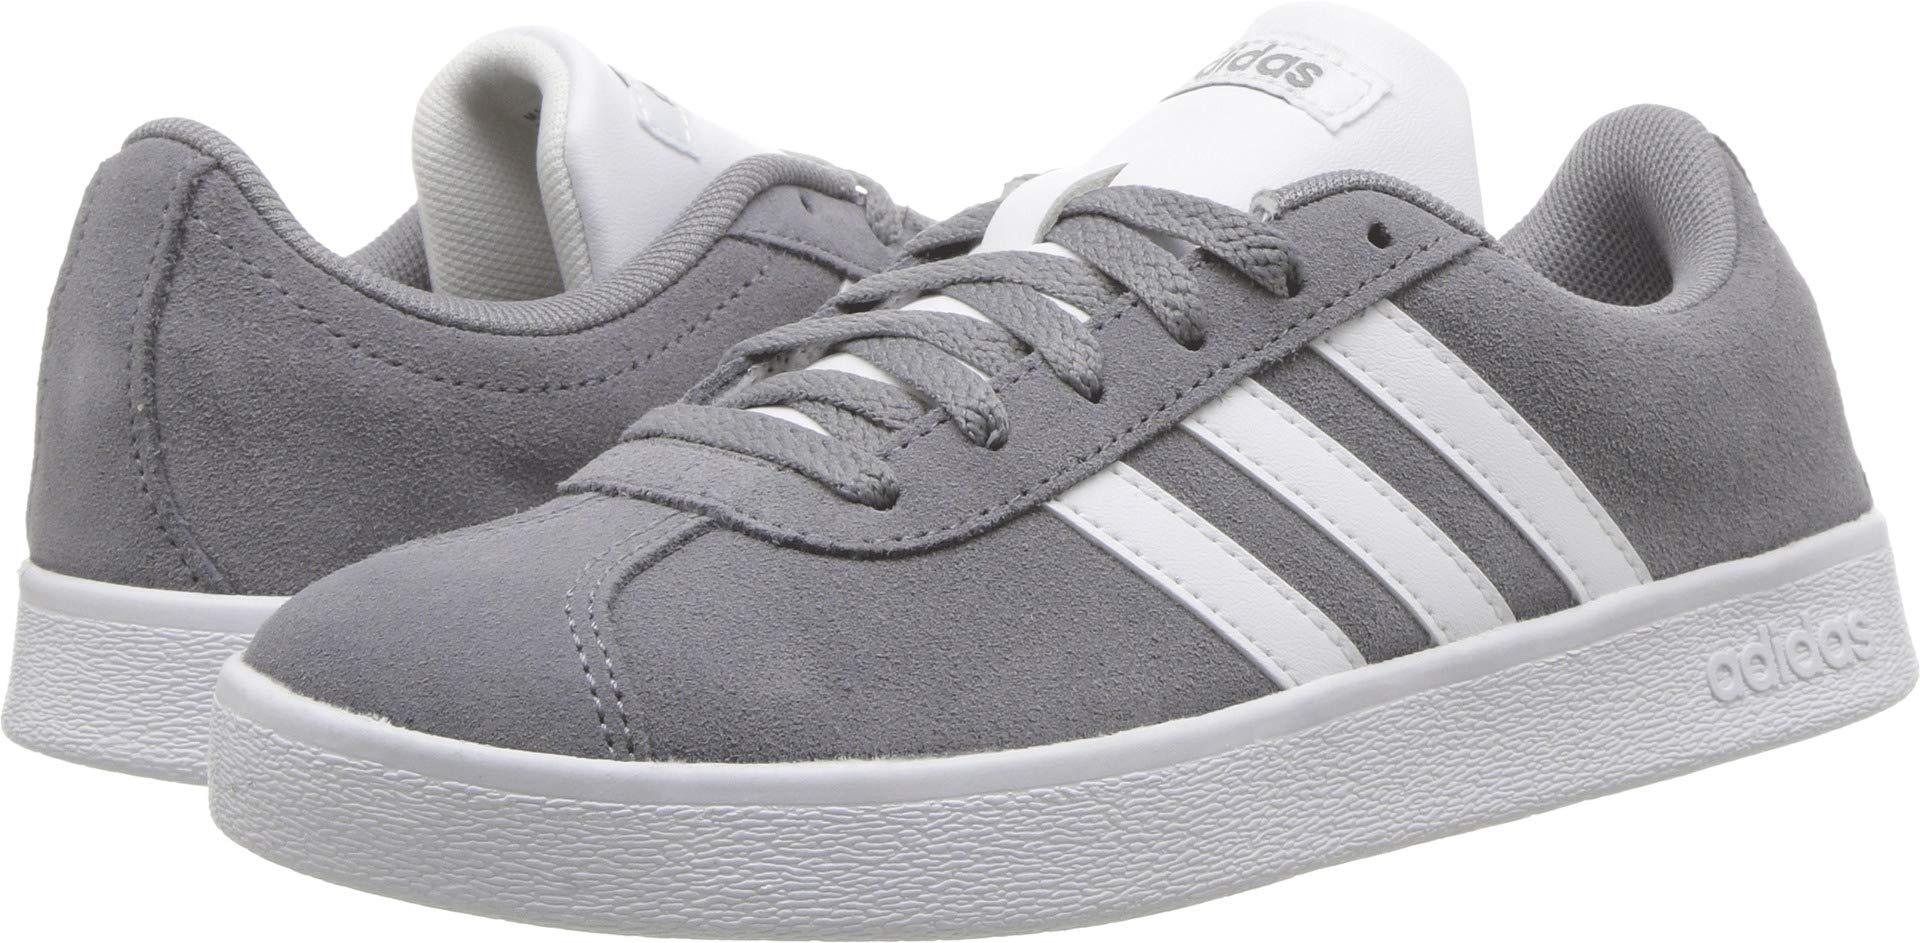 adidas Kids' VL Court 2.0 Sneaker, Grey/White/Grey, 2.5 M US Little Kid